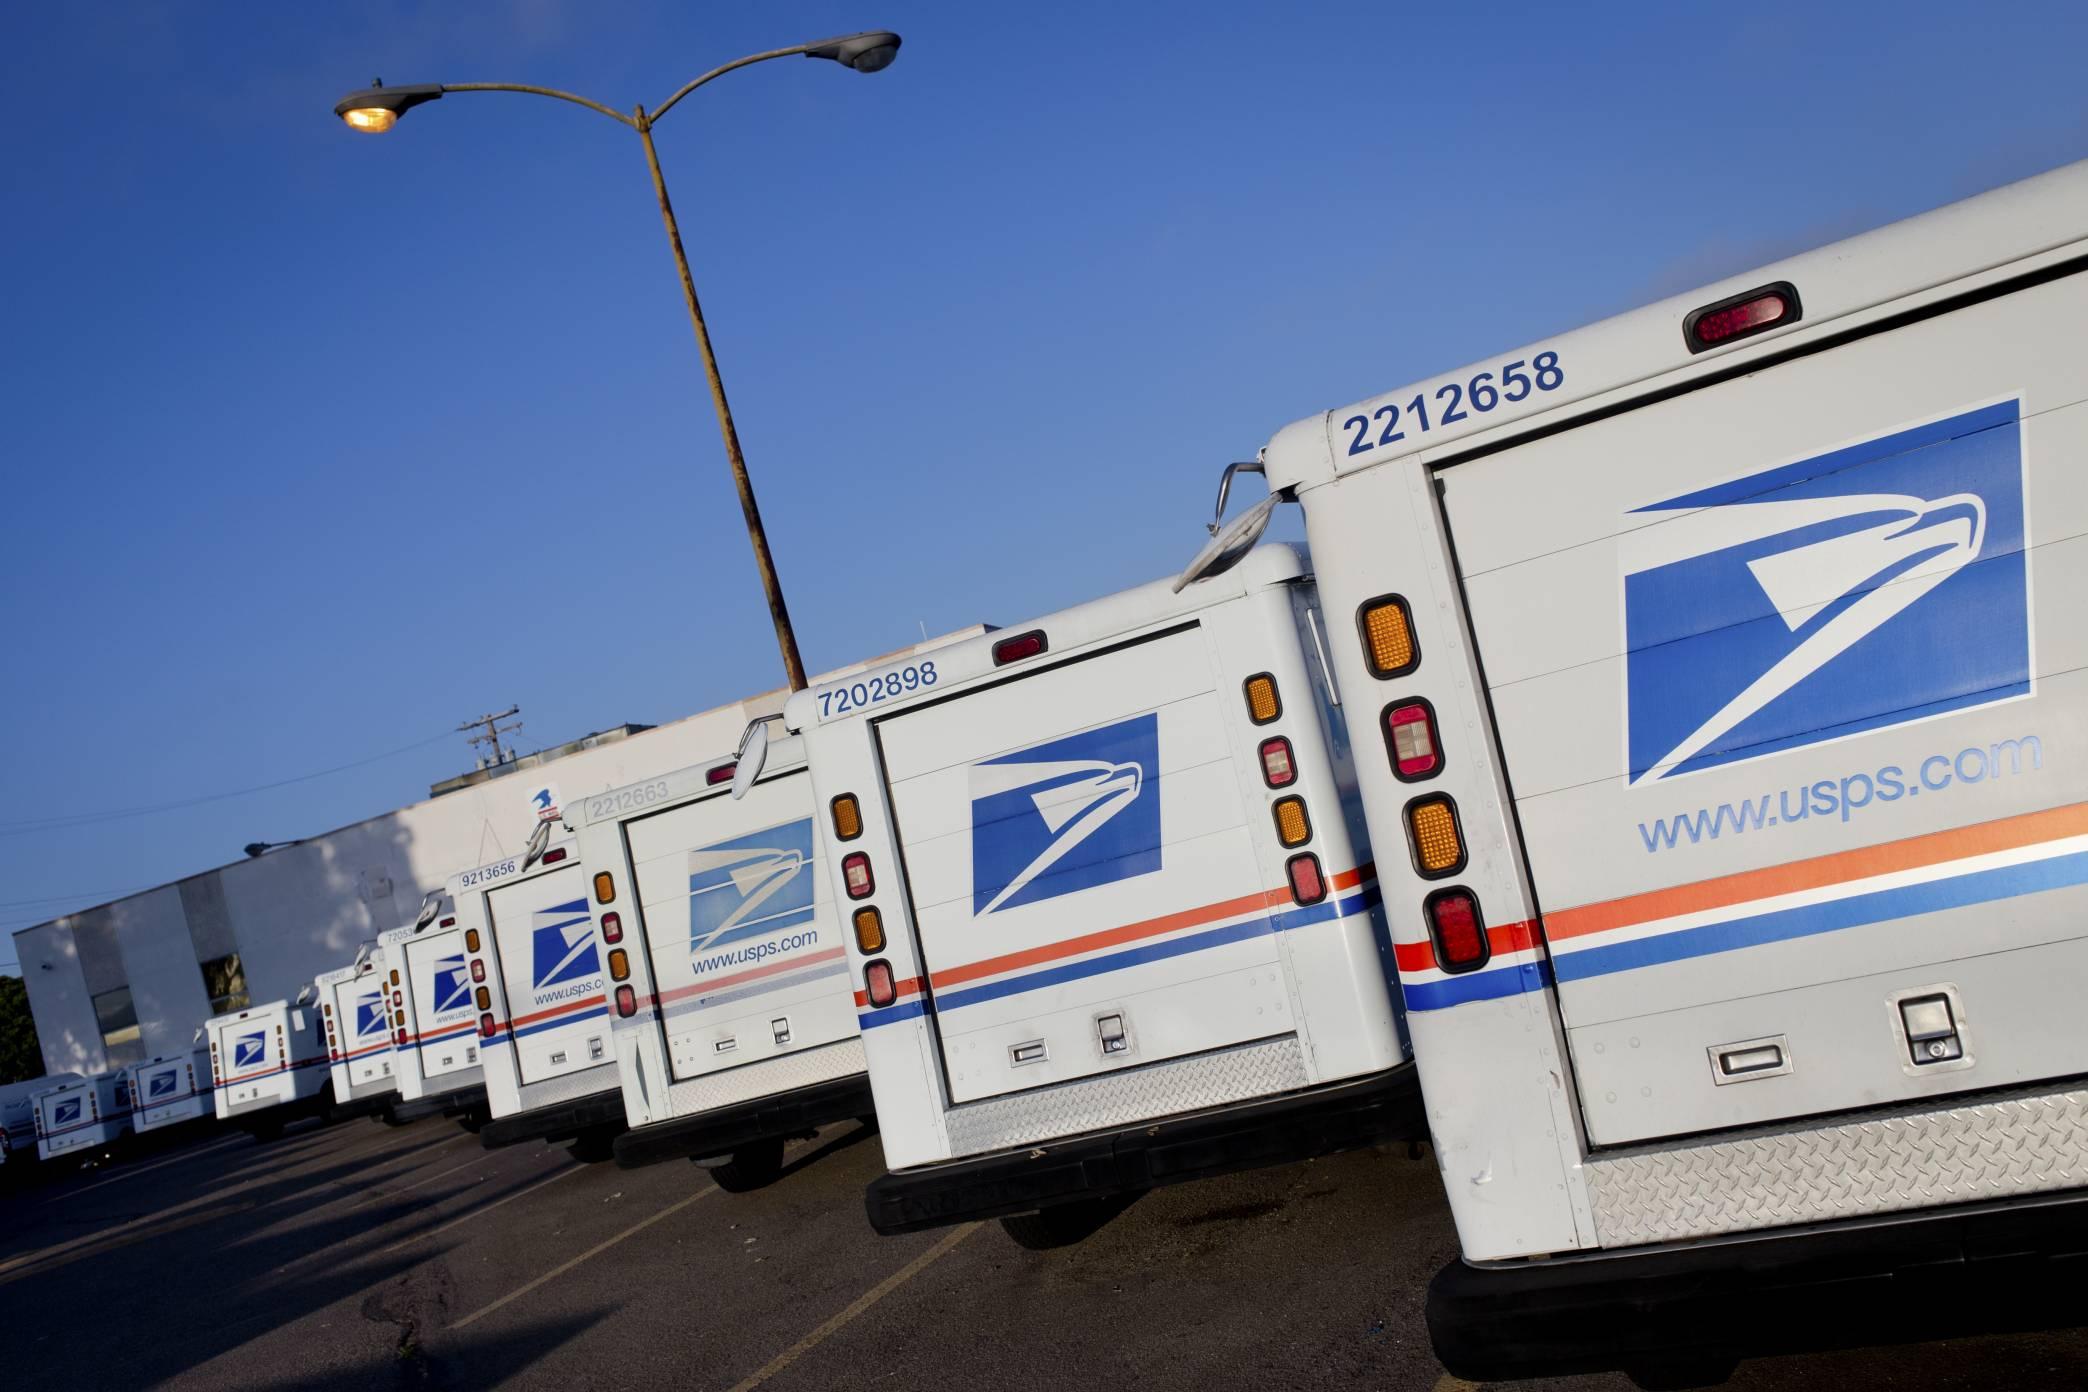 USPS delivery trucks